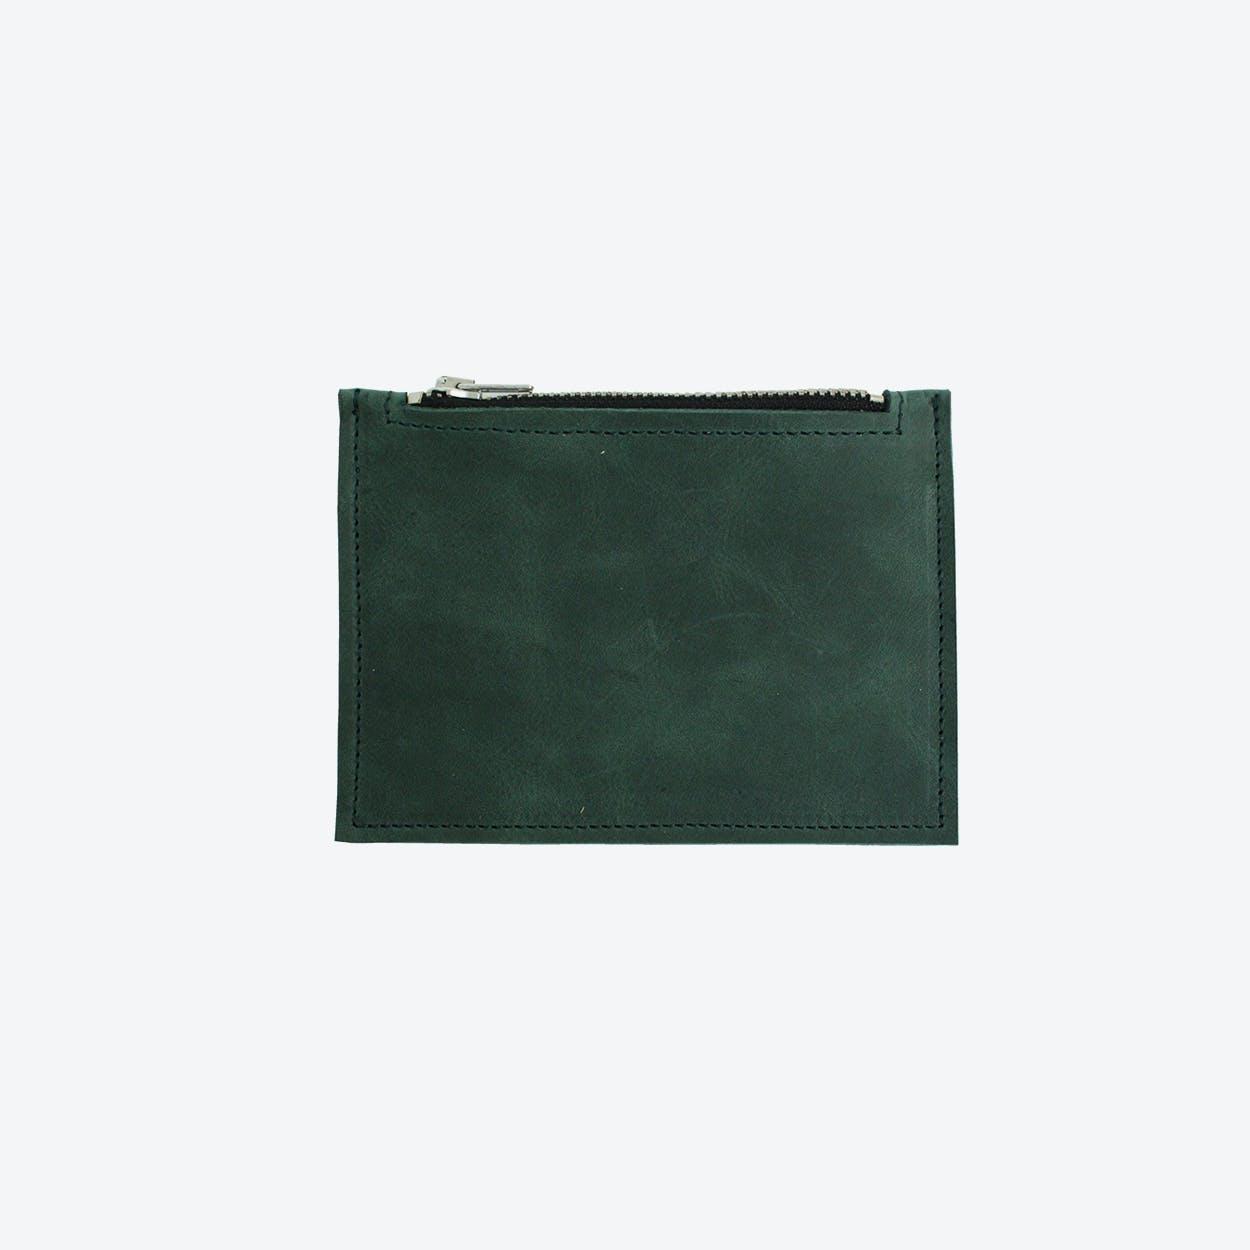 Cardholder - Green